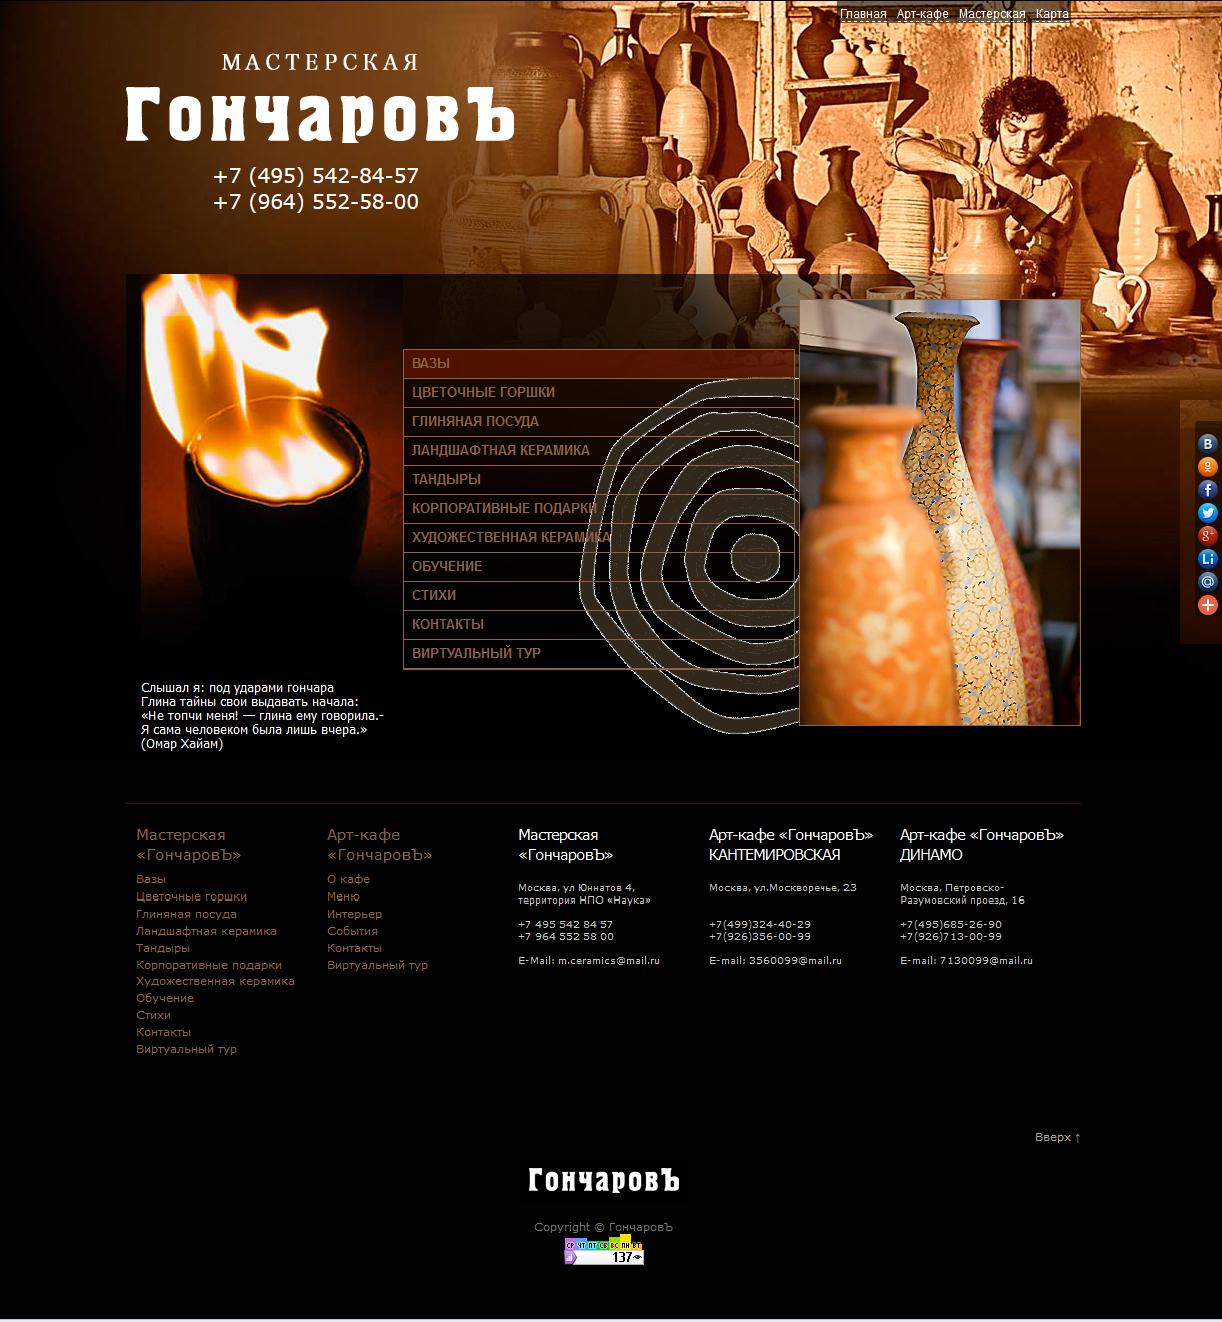 сайт ГончаровЪ - мастерская и арт-кафе mskr.ru, г. Москва